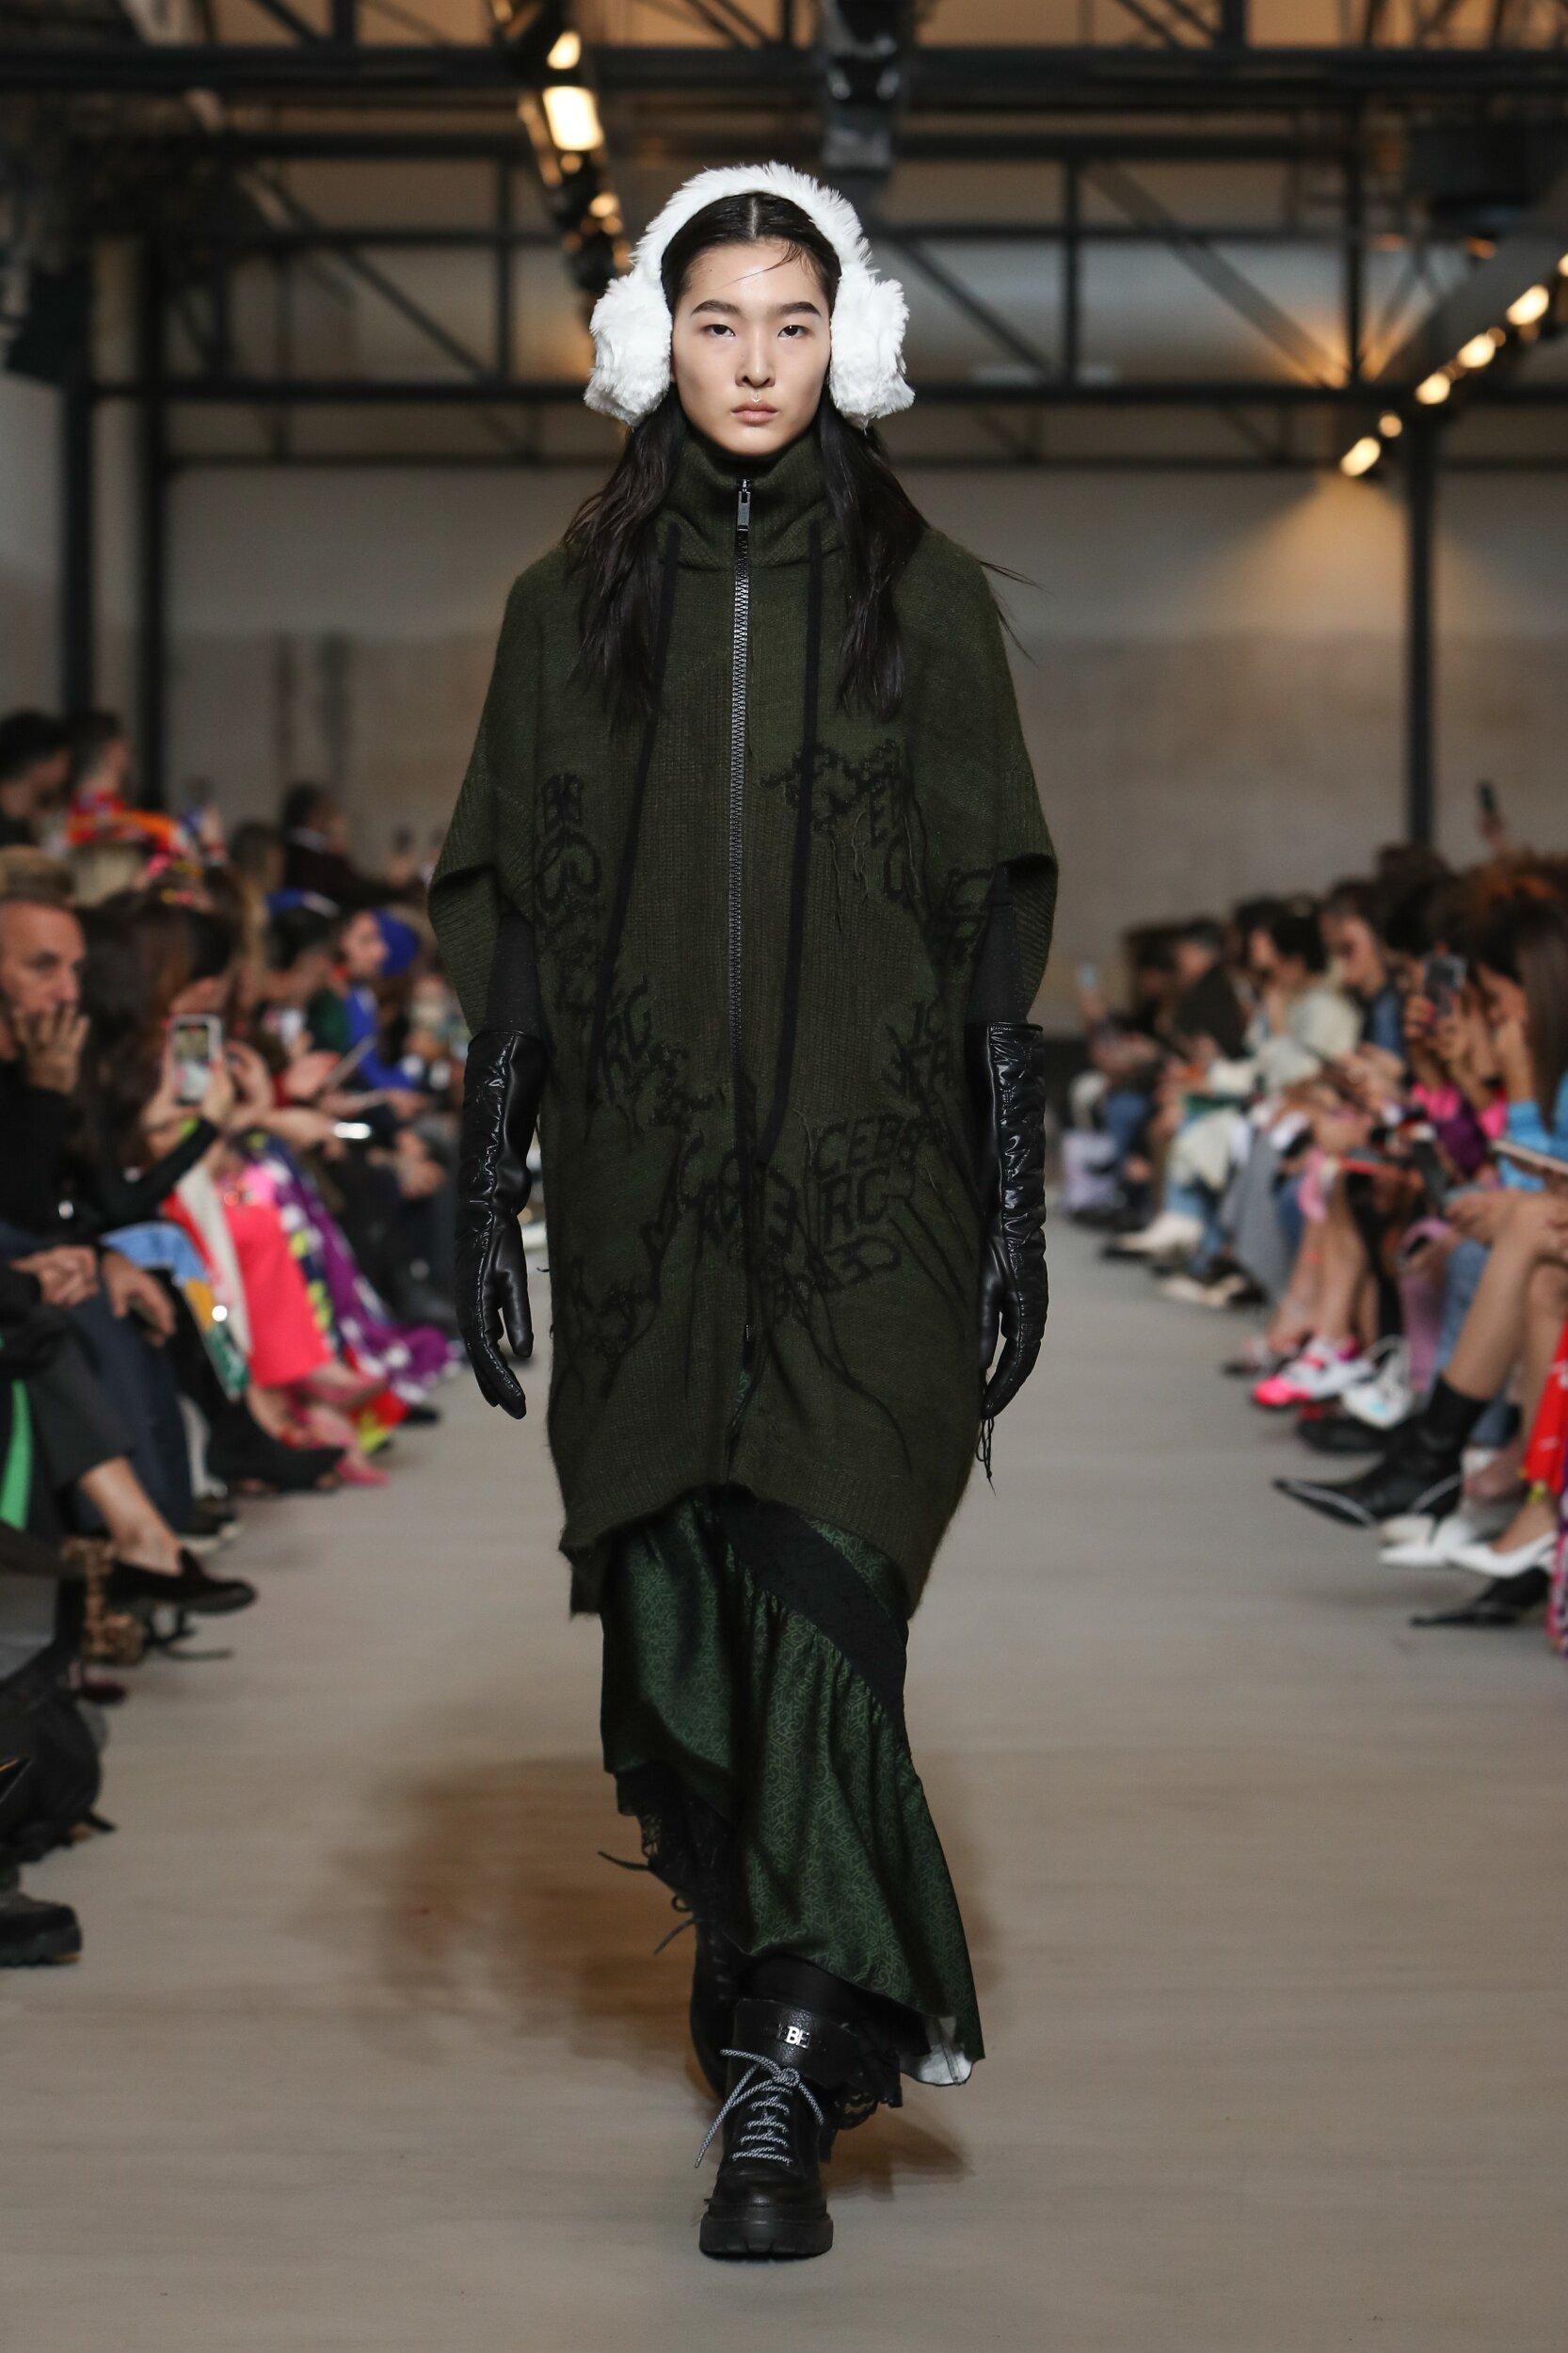 Fashion Show Woman Model Iceberg Catwalk